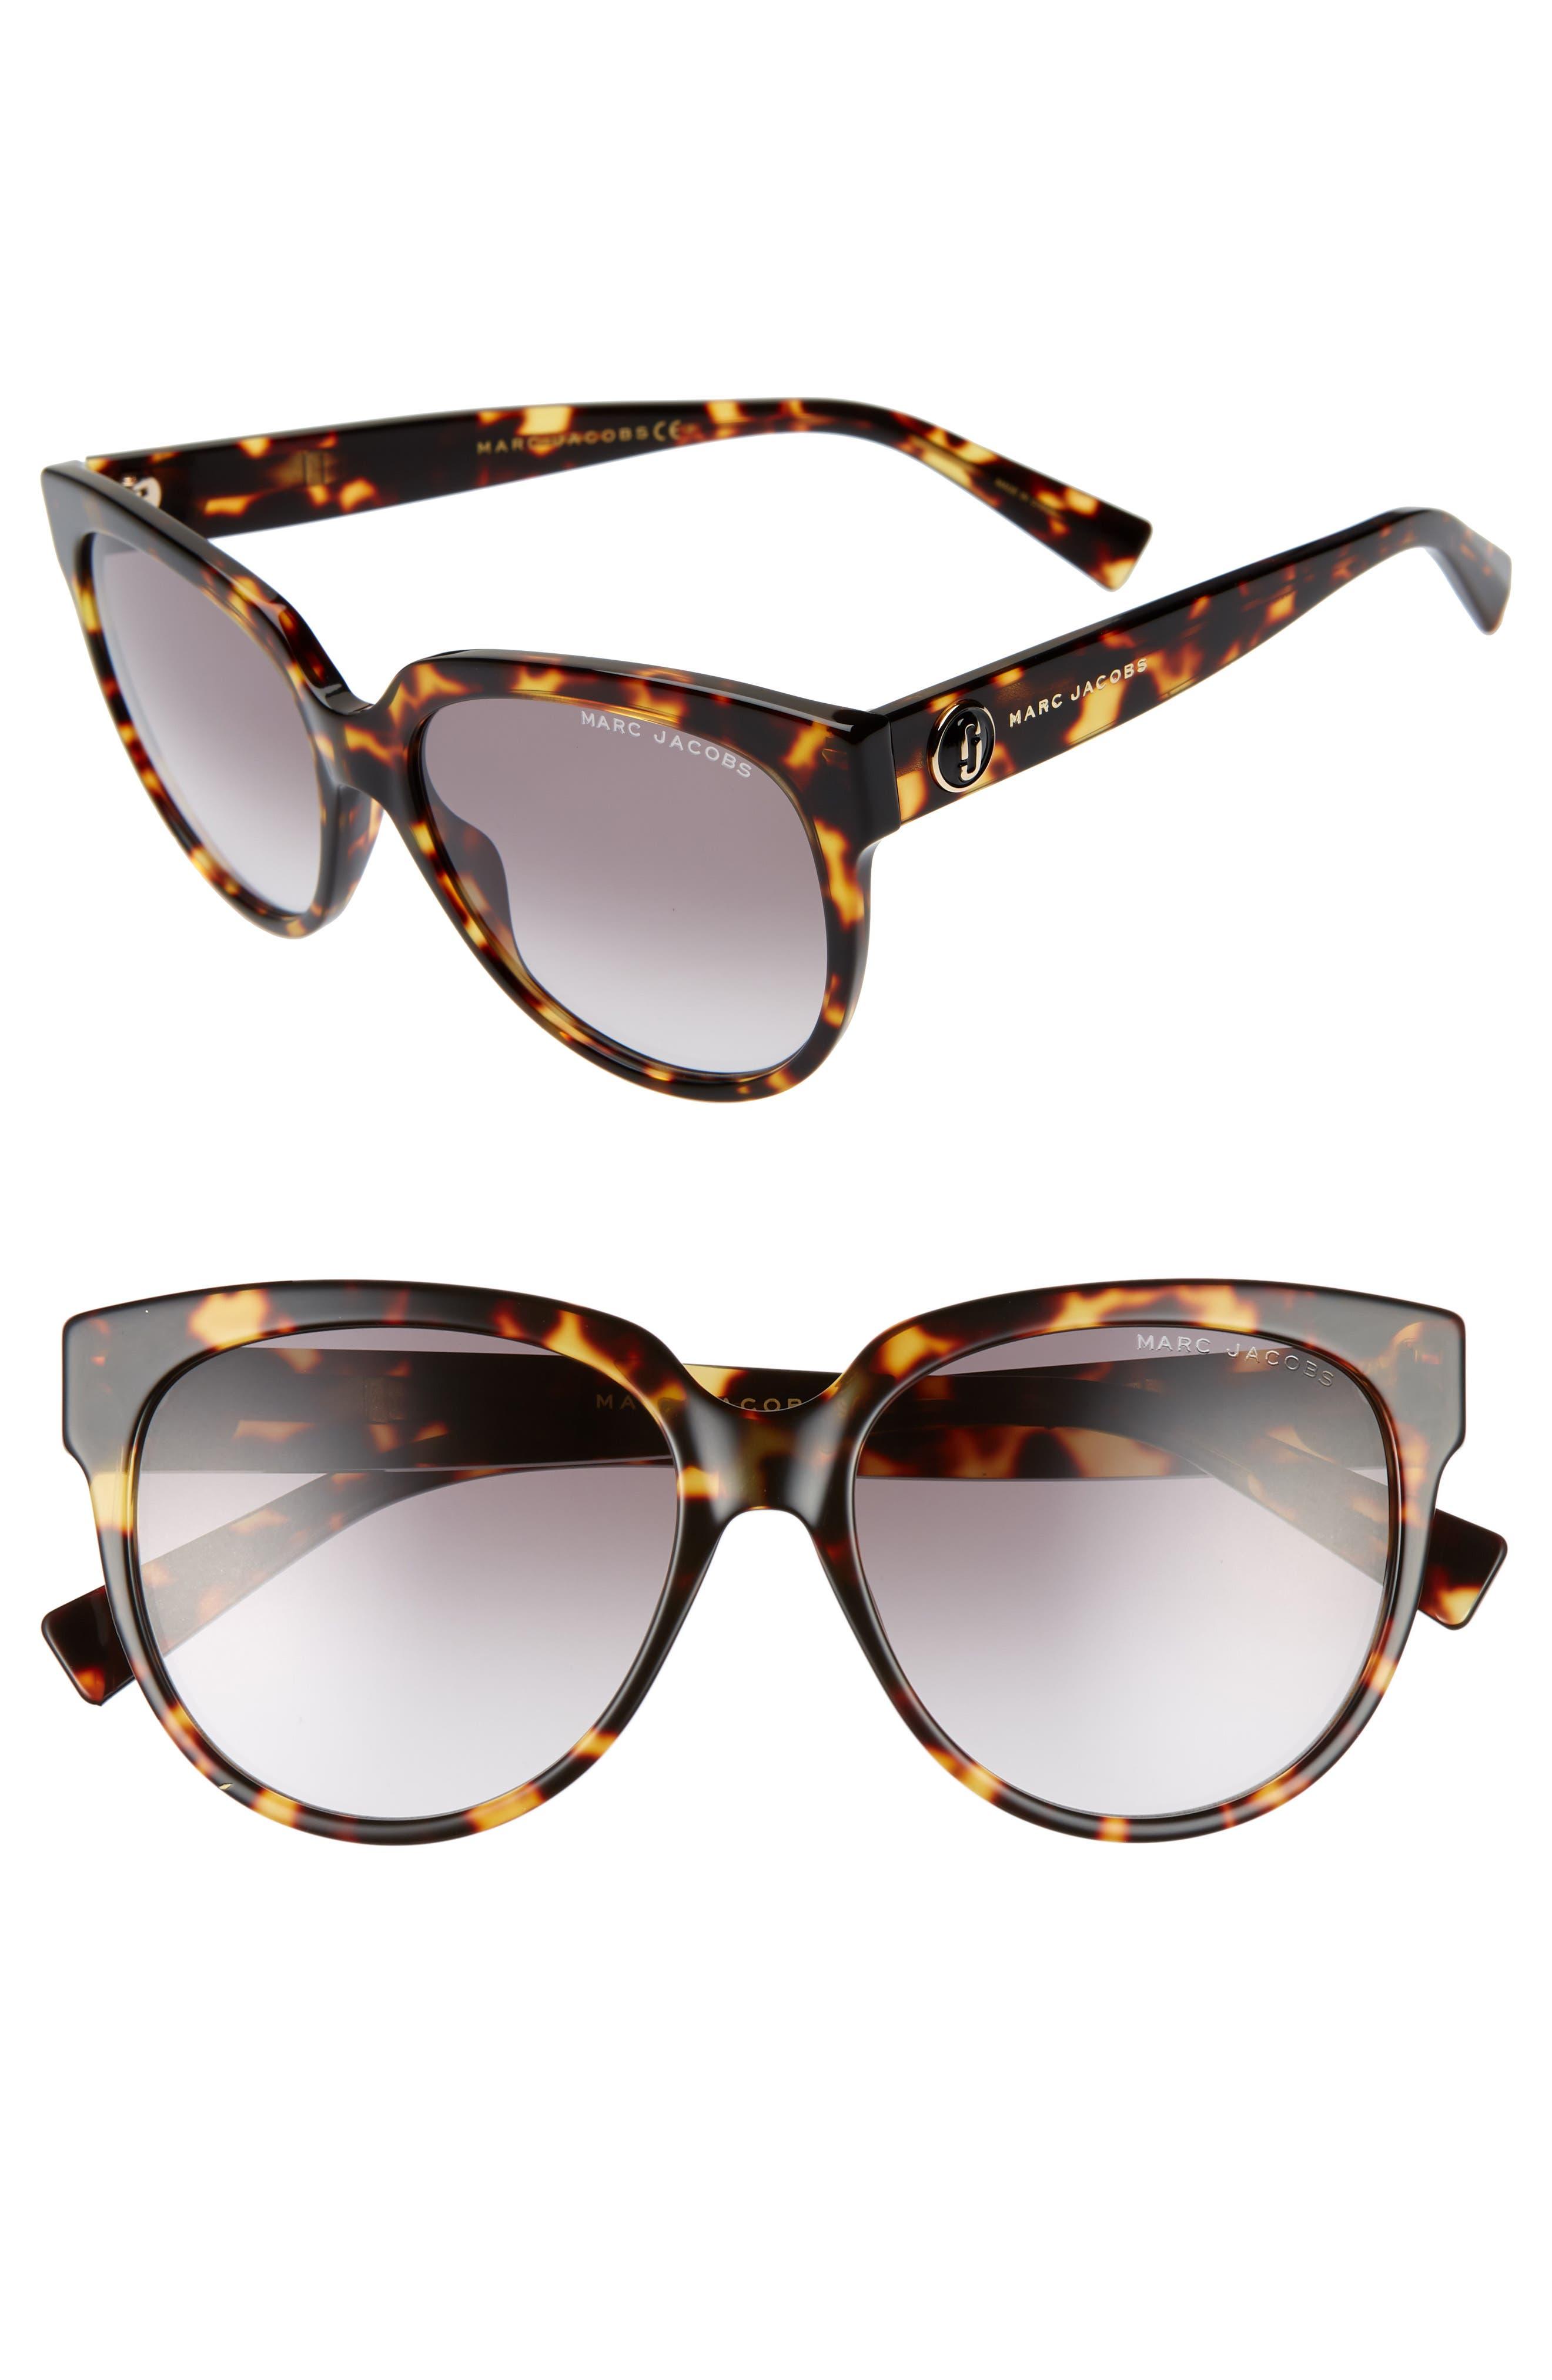 f9bb3454cf1d MARC JACOBS Sunglasses for Women   Nordstrom